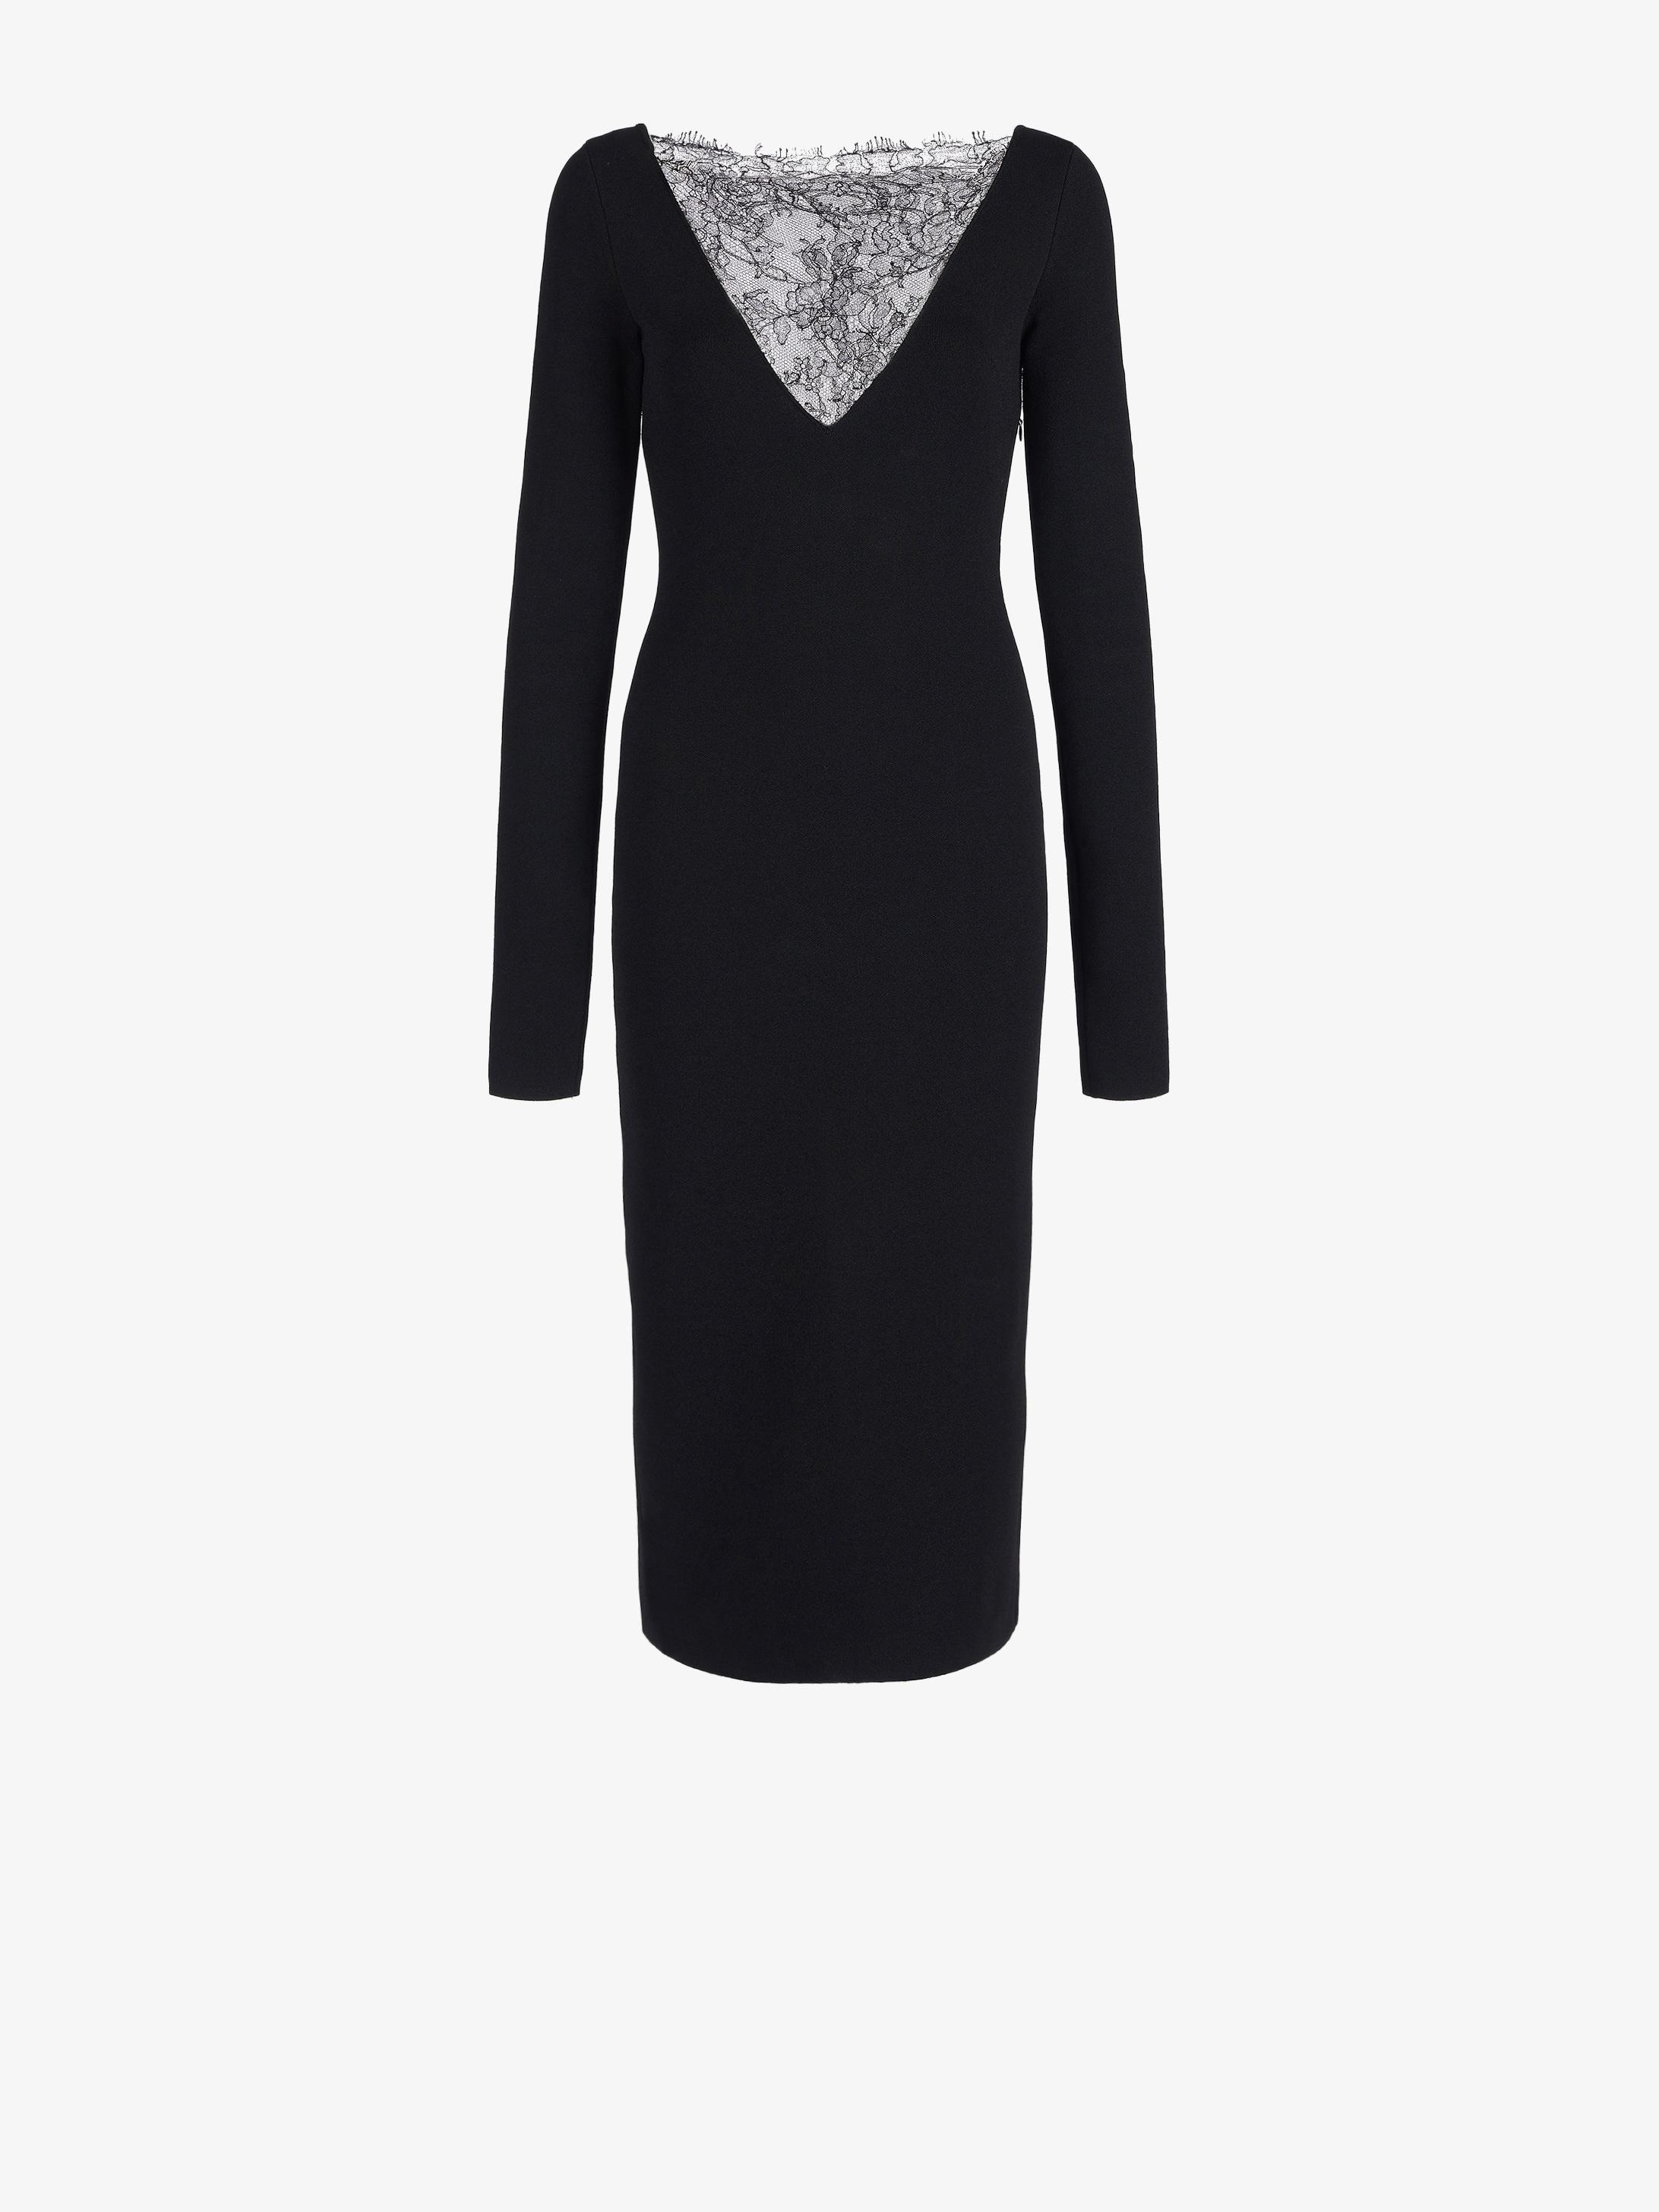 Midi dress with intarsia lace